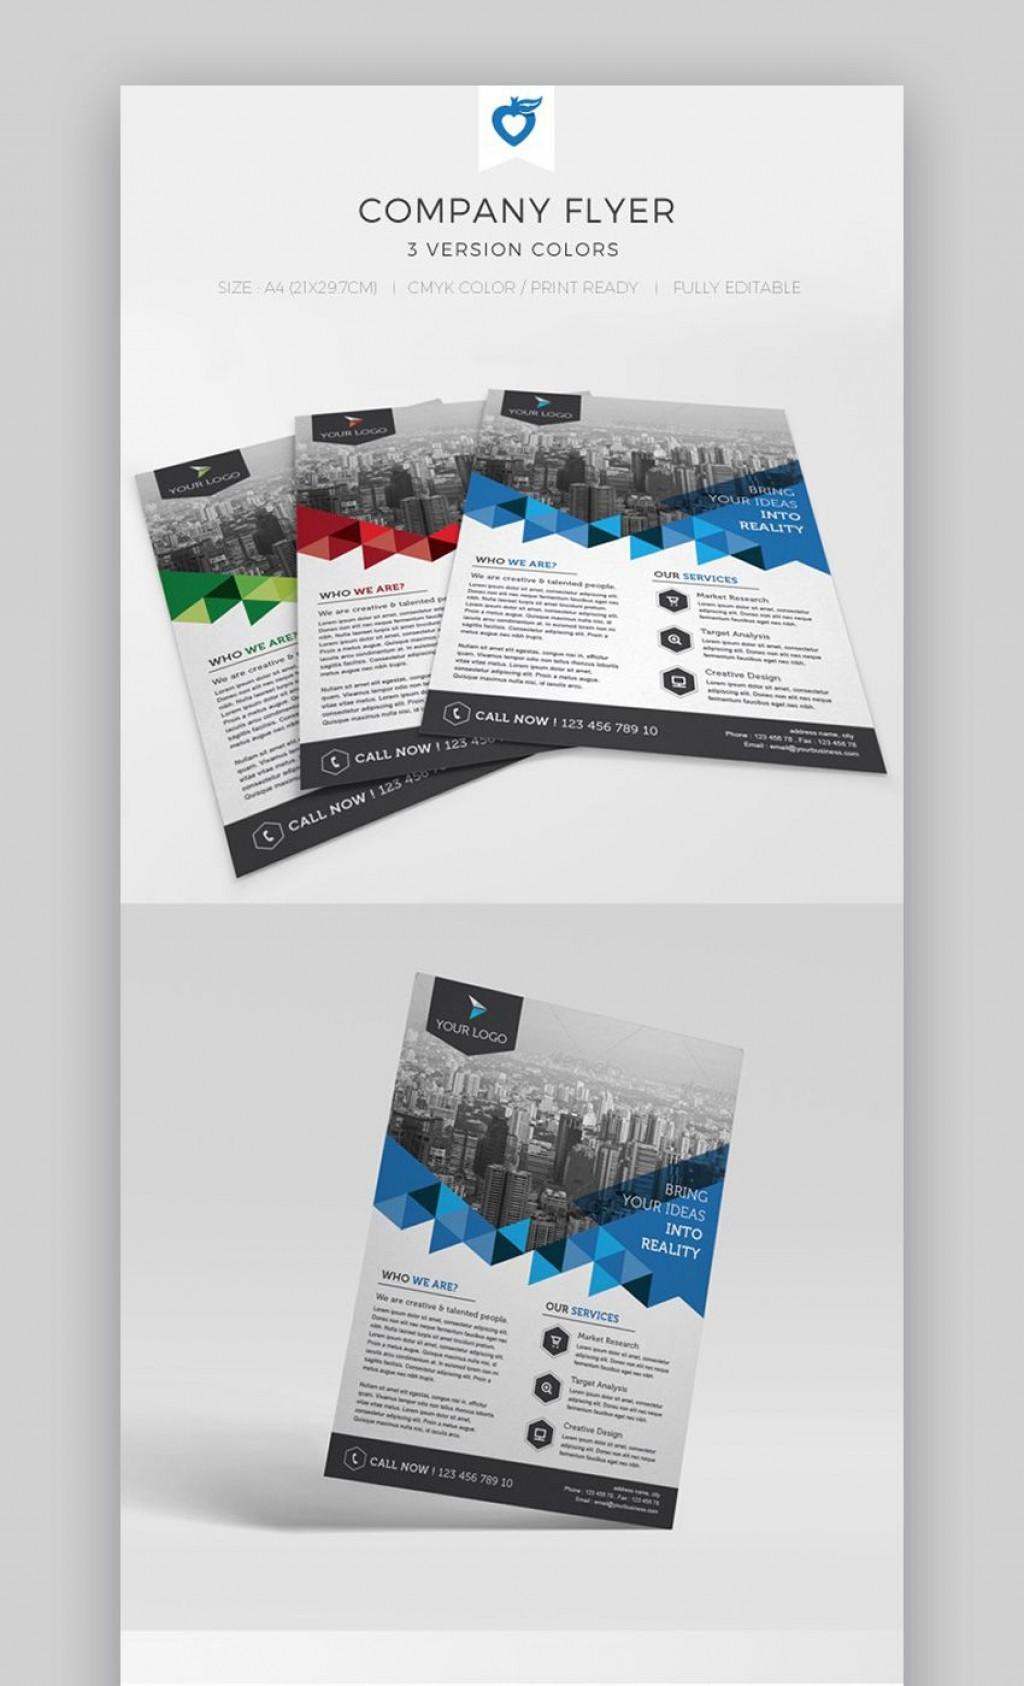 002 Singular Free Print Ad Template Sample  Templates Real Estate For WordLarge